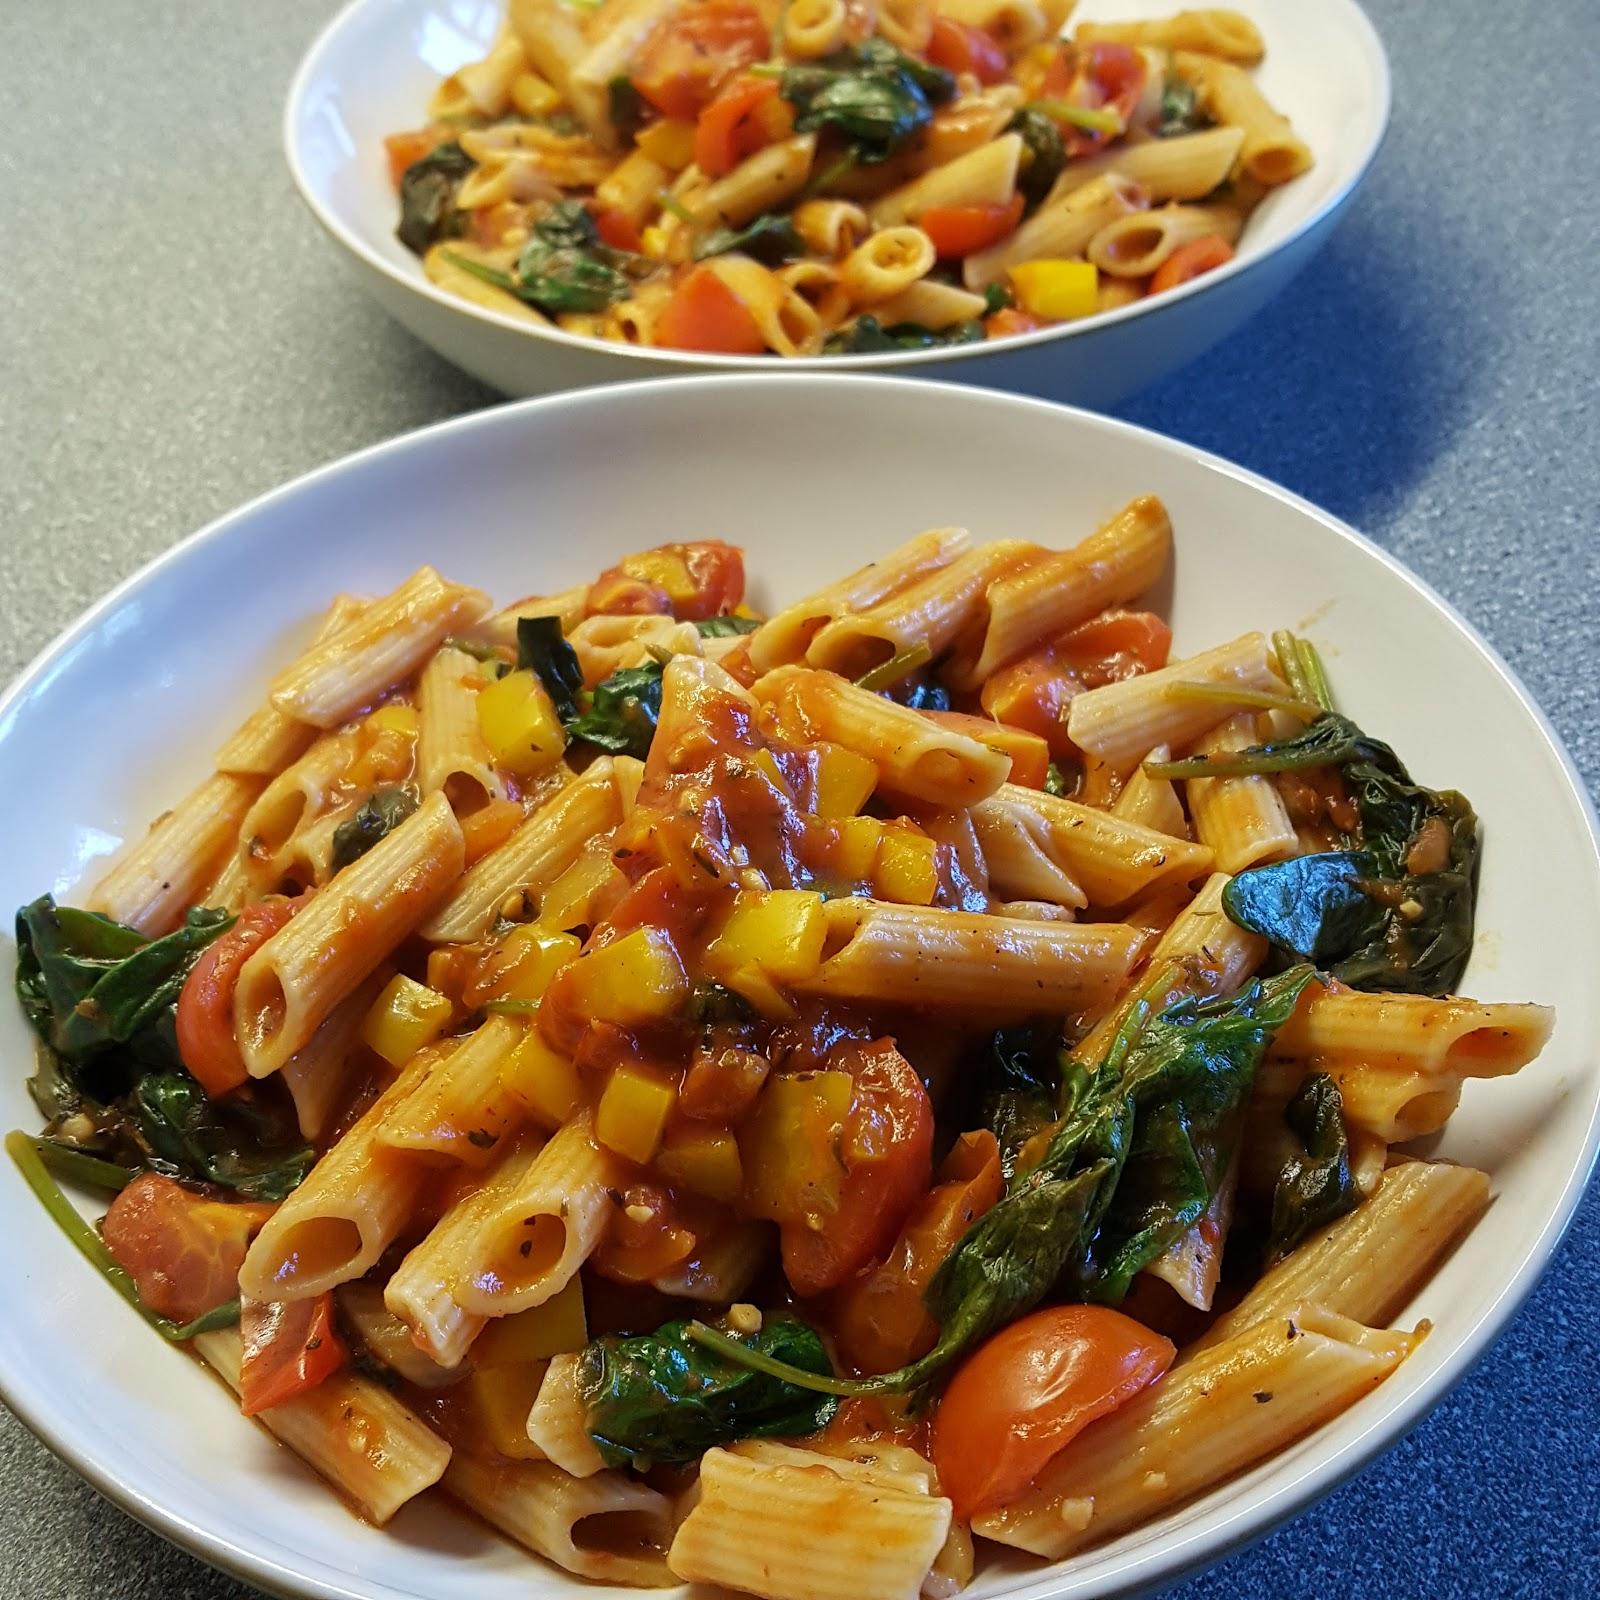 Gluten free vegan pasta